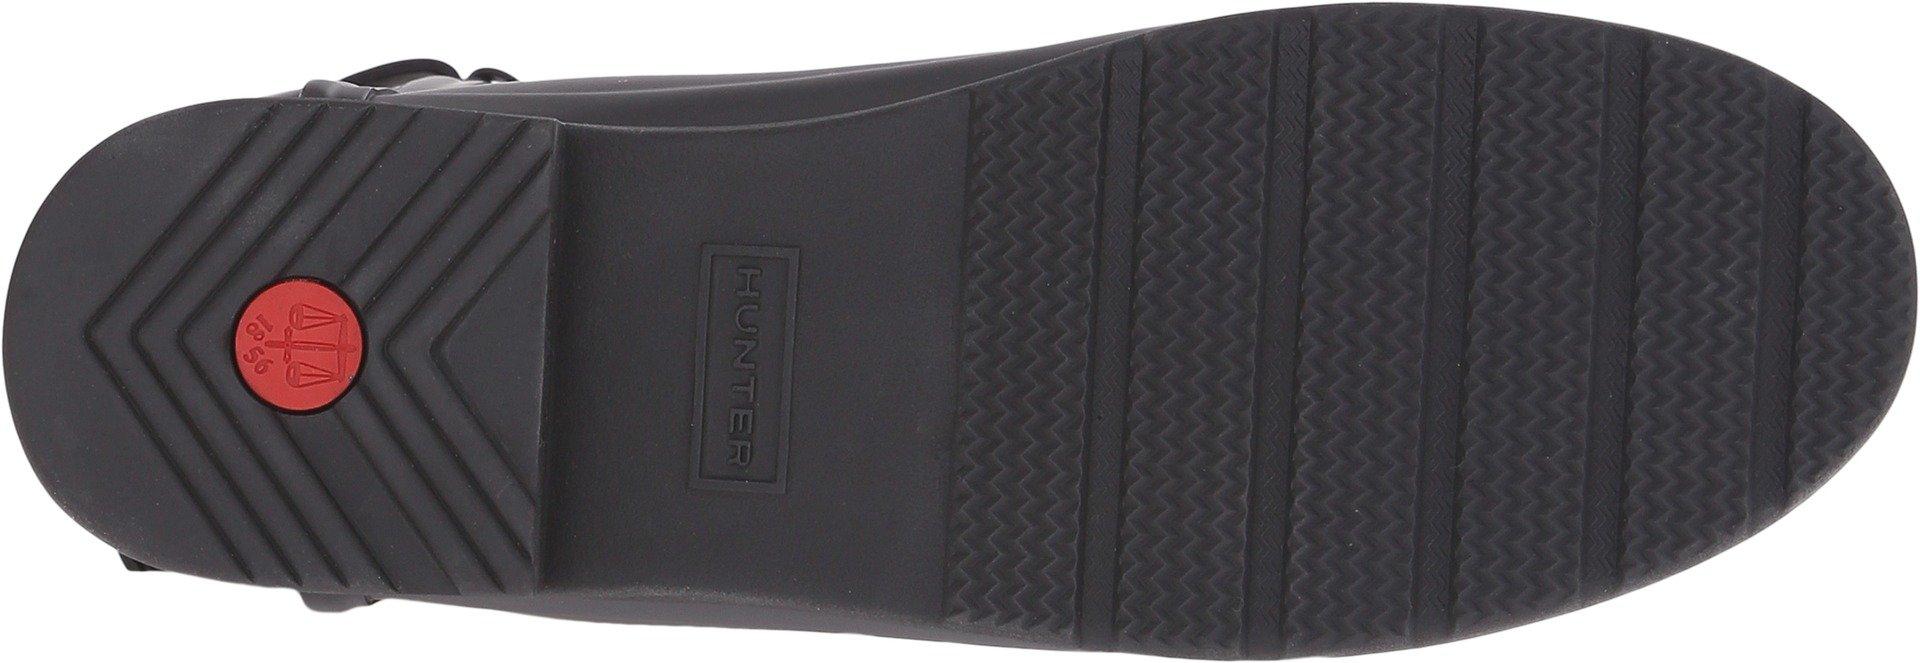 Hunter Women's Original Short Refined Back Strap Rain Boots Black 6 M US by Hunter